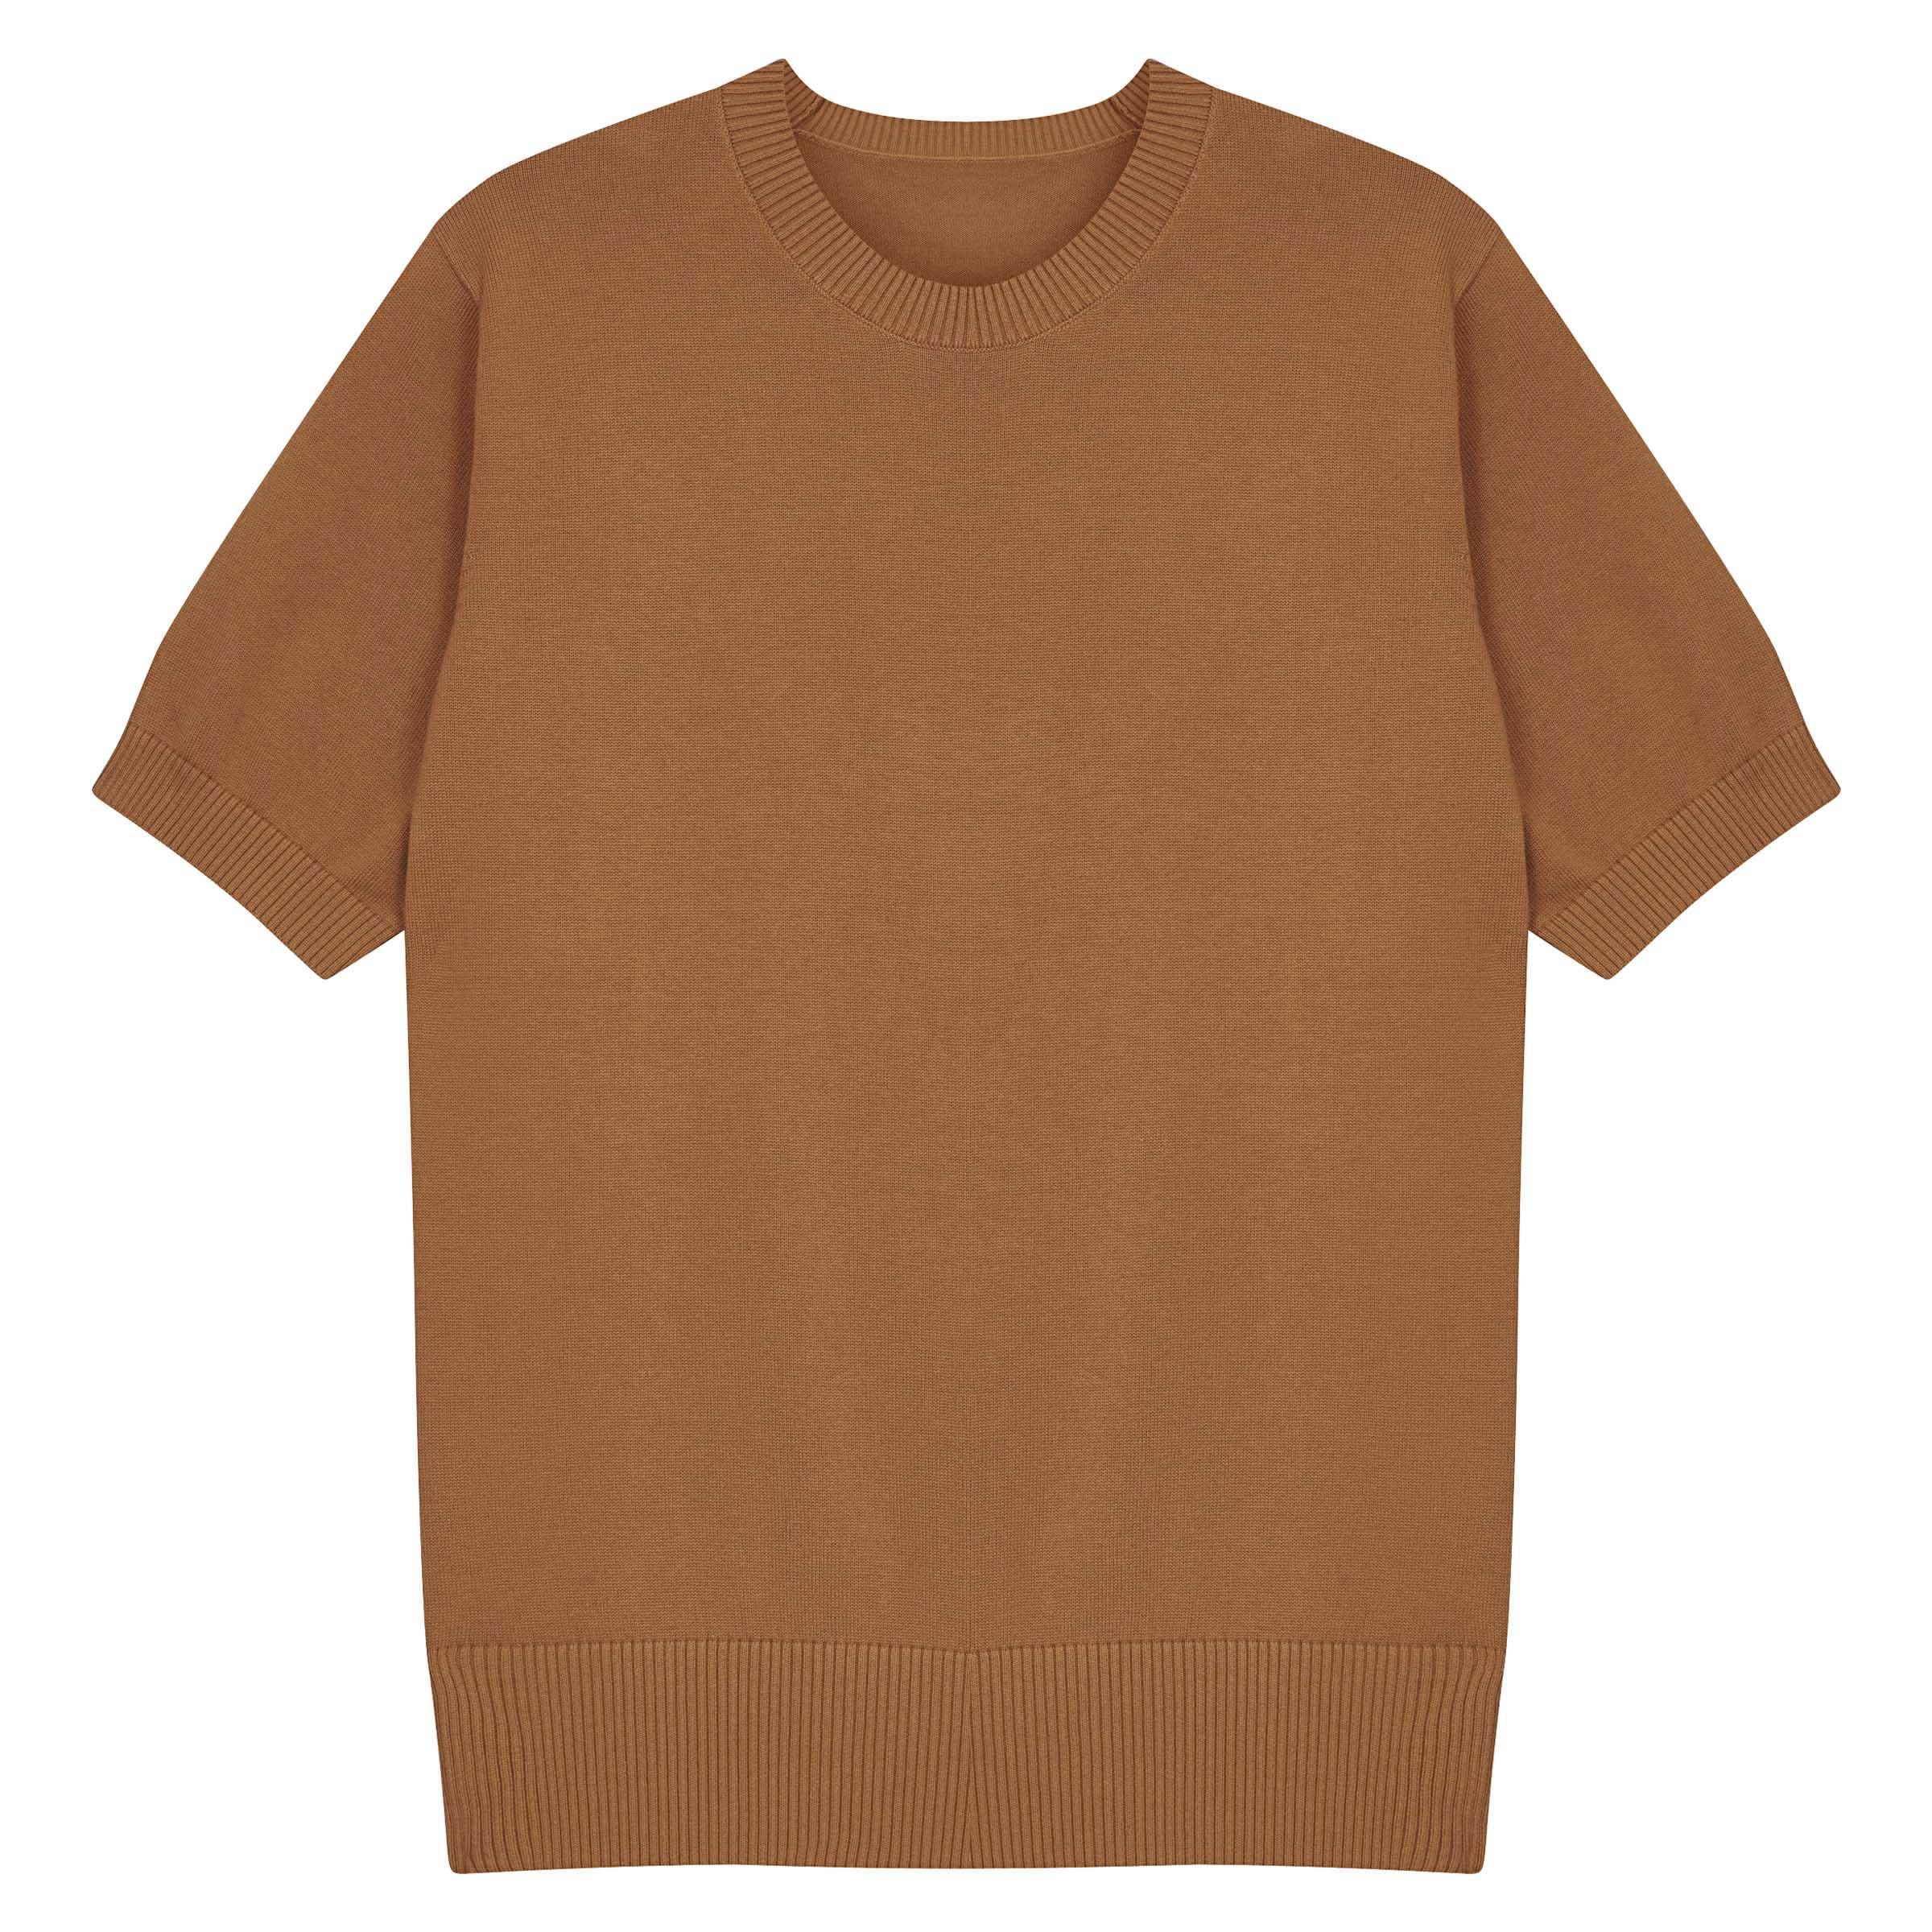 Caramel Knitted Supima Cotton T-Shirt